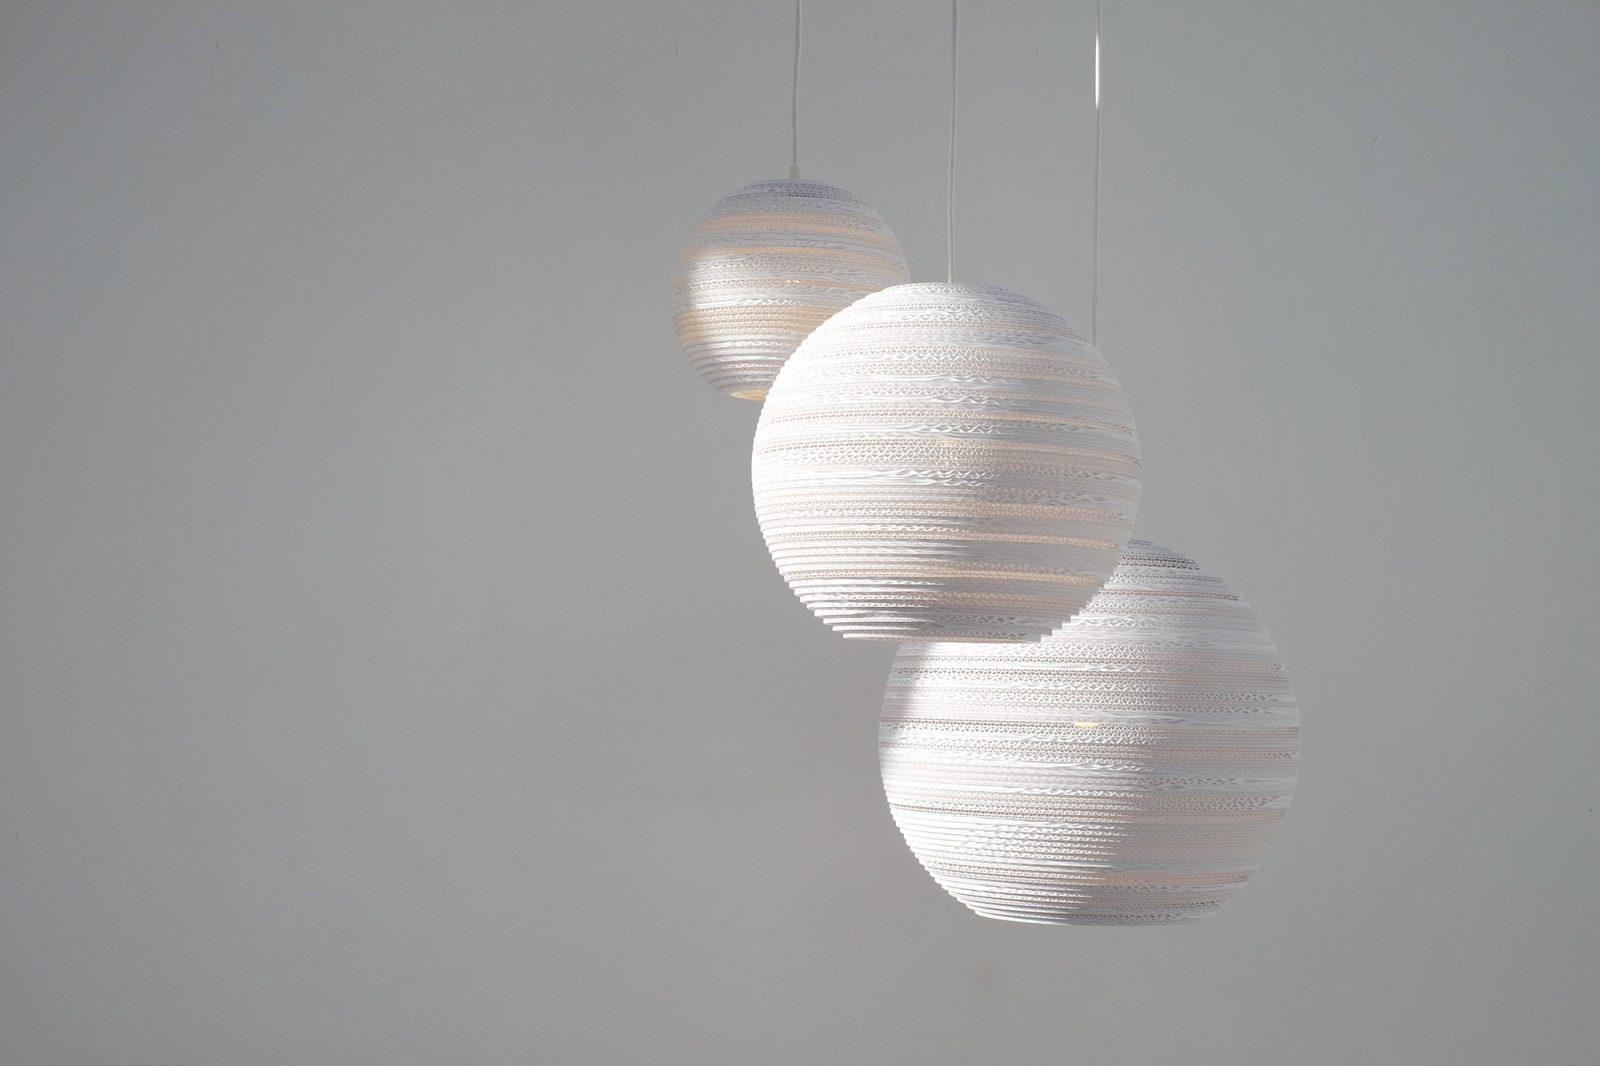 Moon 10 Scraplight White Pendant Light-31519